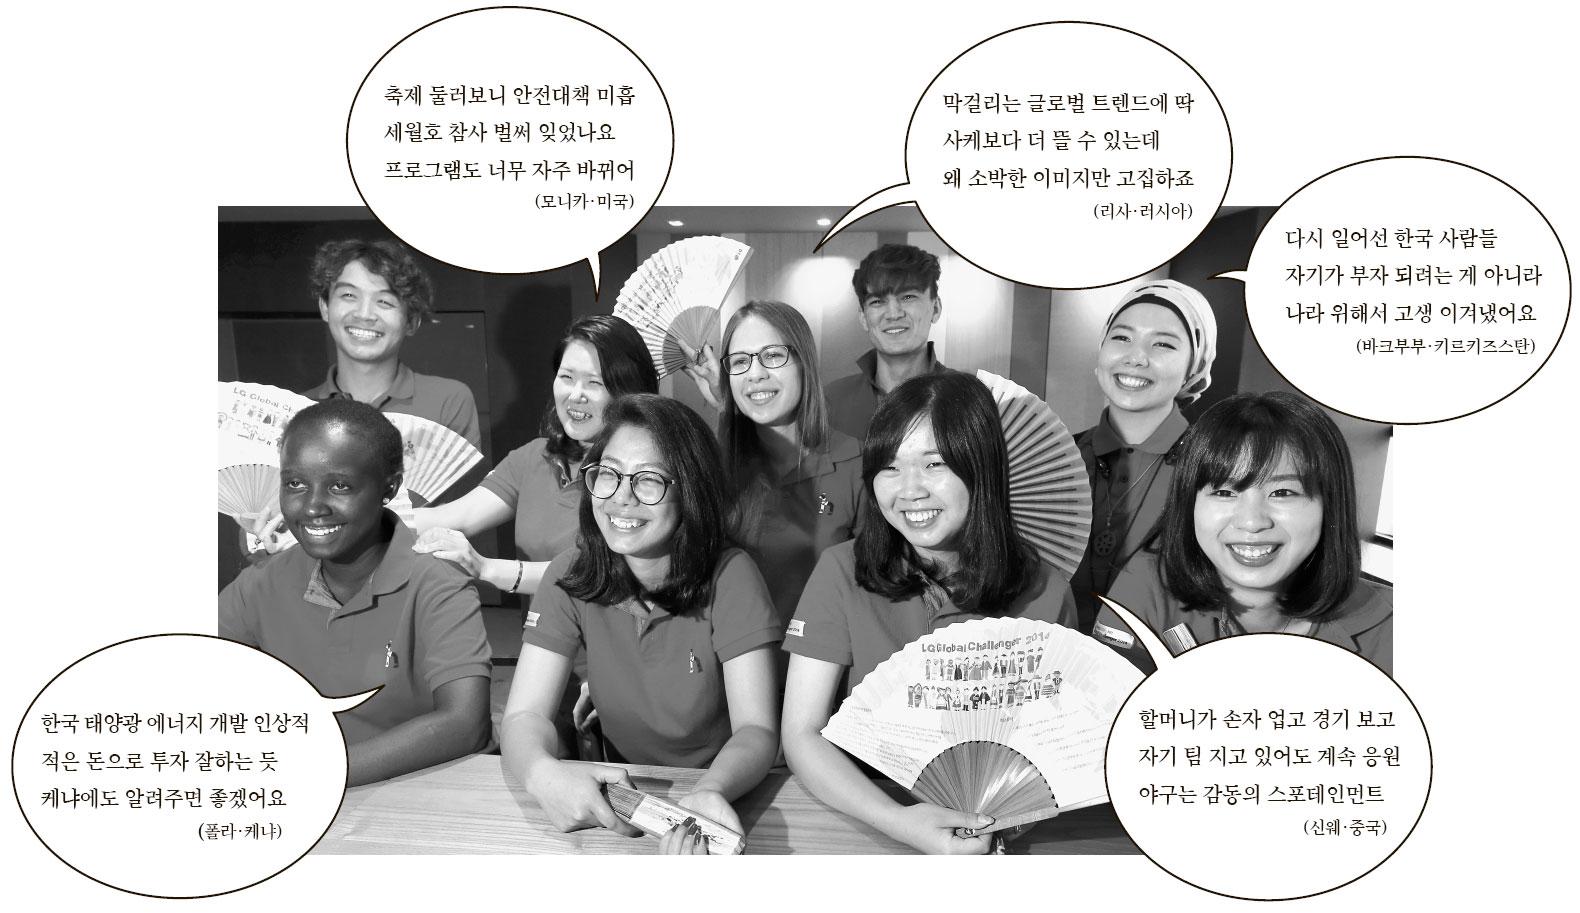 「LGグローバルチャレンジャー2014」プロジェクトに参加し、韓国の産業現場を探訪してきた外国人大学生が22日、ソウル麻浦のあるカフェに集まった。後列左から時計回りにジェニスベクさん(カザフスタン)、モニカさん(米国)、リサさん(ロシア)、アクバルさん(ウズベキスタン)、バクブブさん(キルギス)、アミカさん(日本)、シンウェさん(中国)、エラさん(ネパール)、ポーラさん(ケニア)。